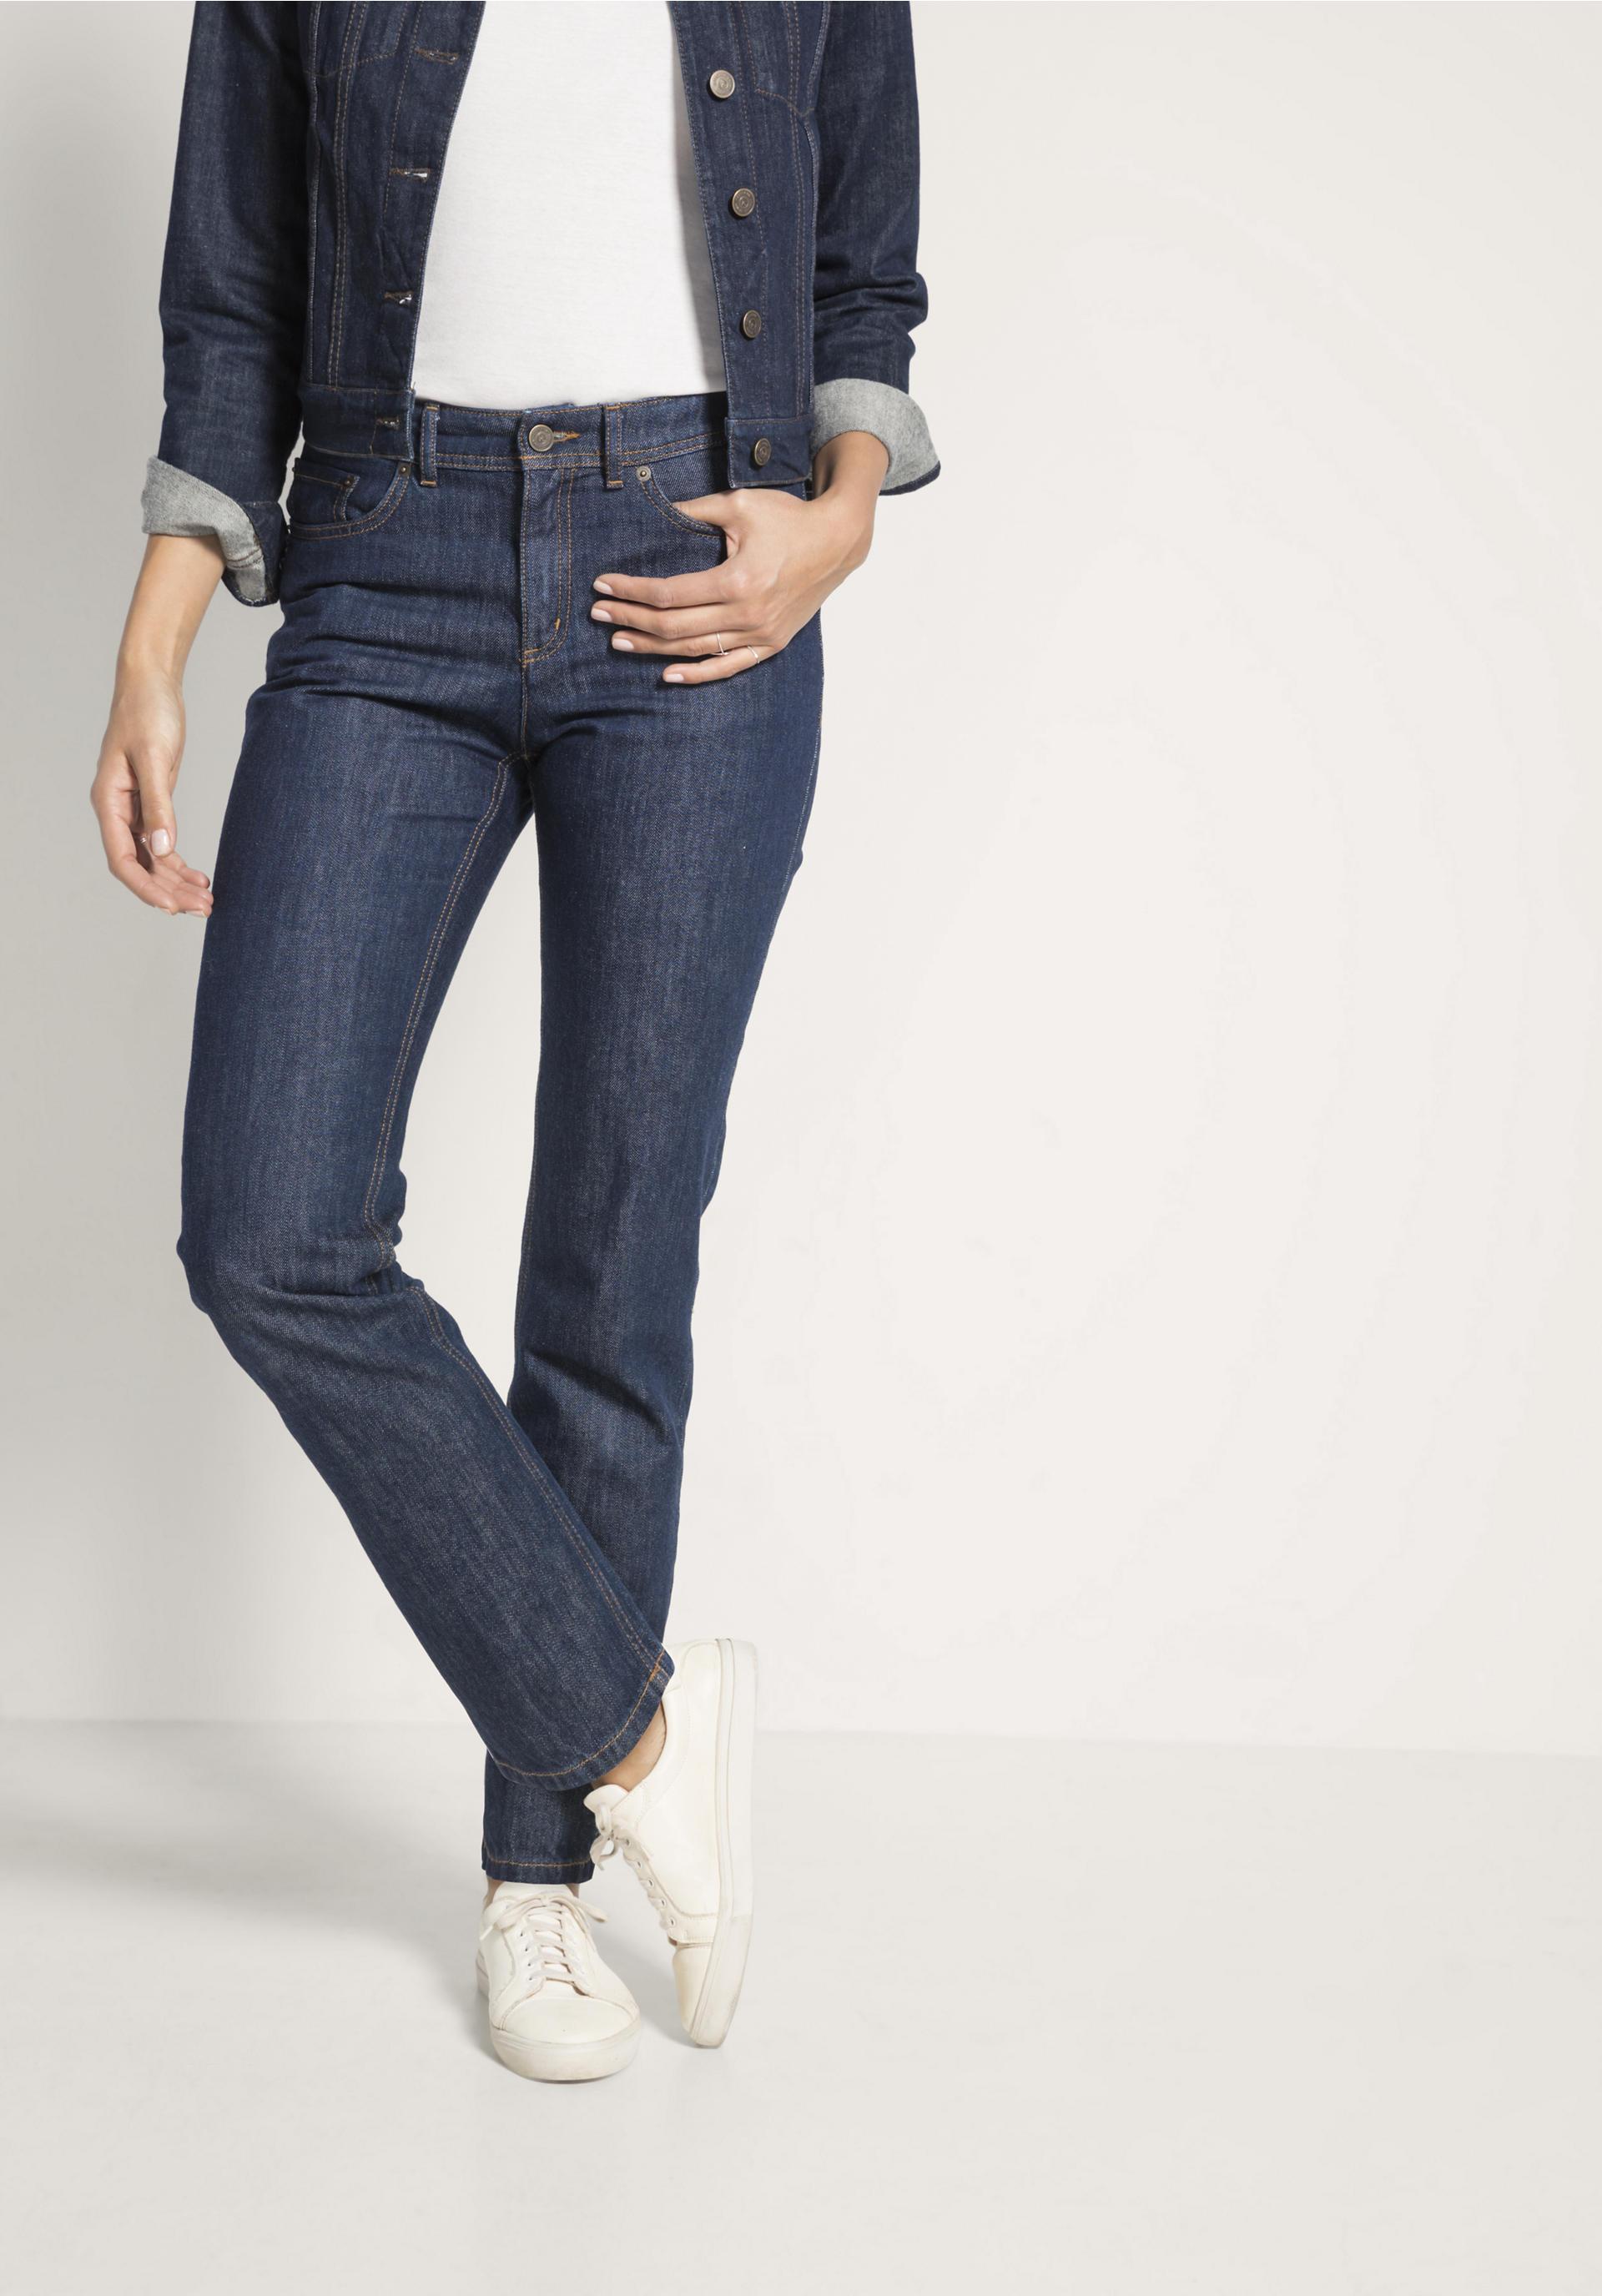 bio jeans f r damen ko jeans hessnatur deutschland. Black Bedroom Furniture Sets. Home Design Ideas